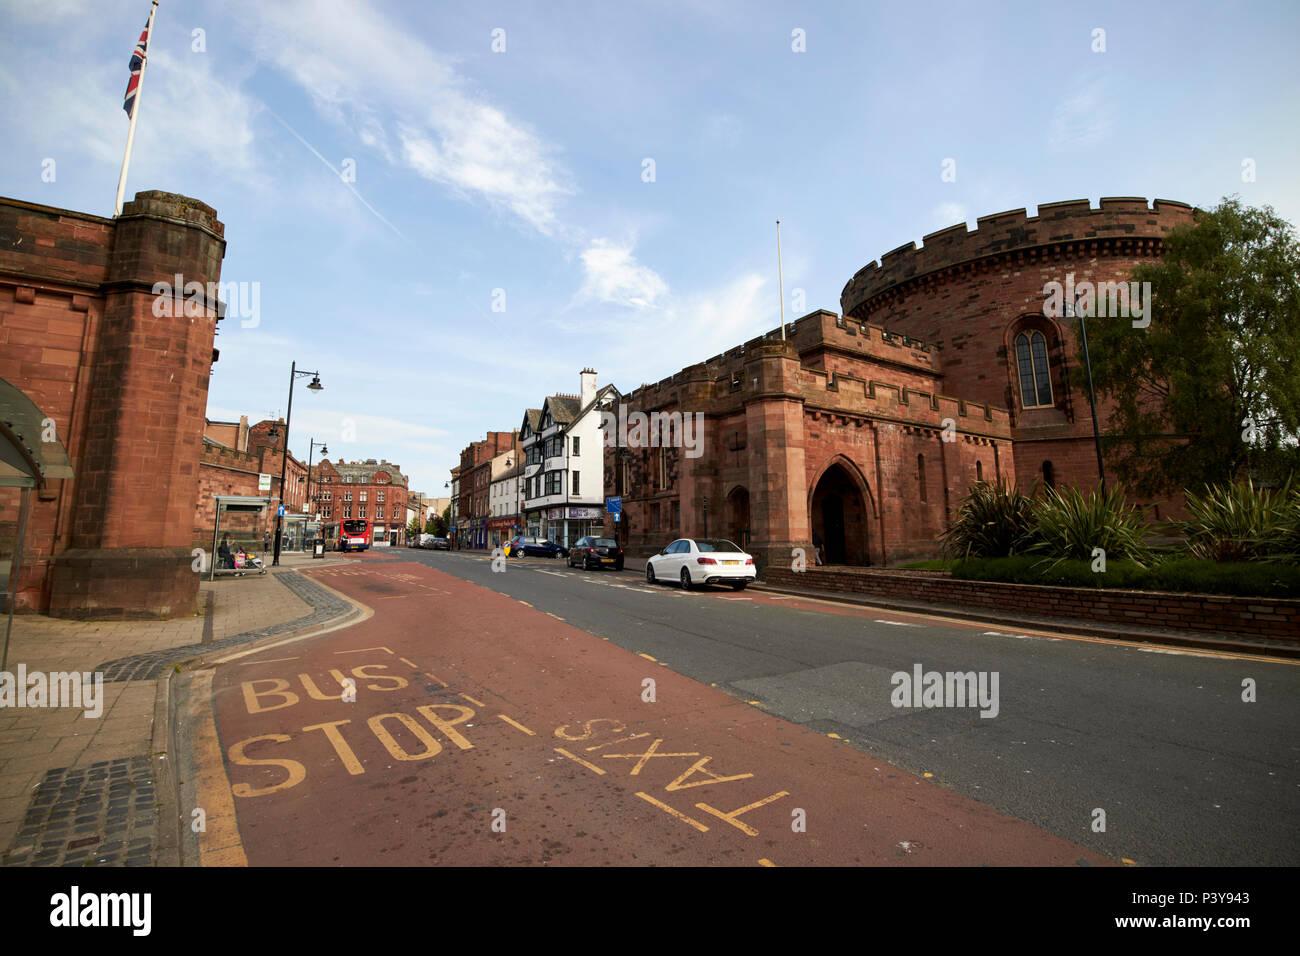 Nisi prius courthouse the citadel east tower Carlisle Cumbria England UK - Stock Image